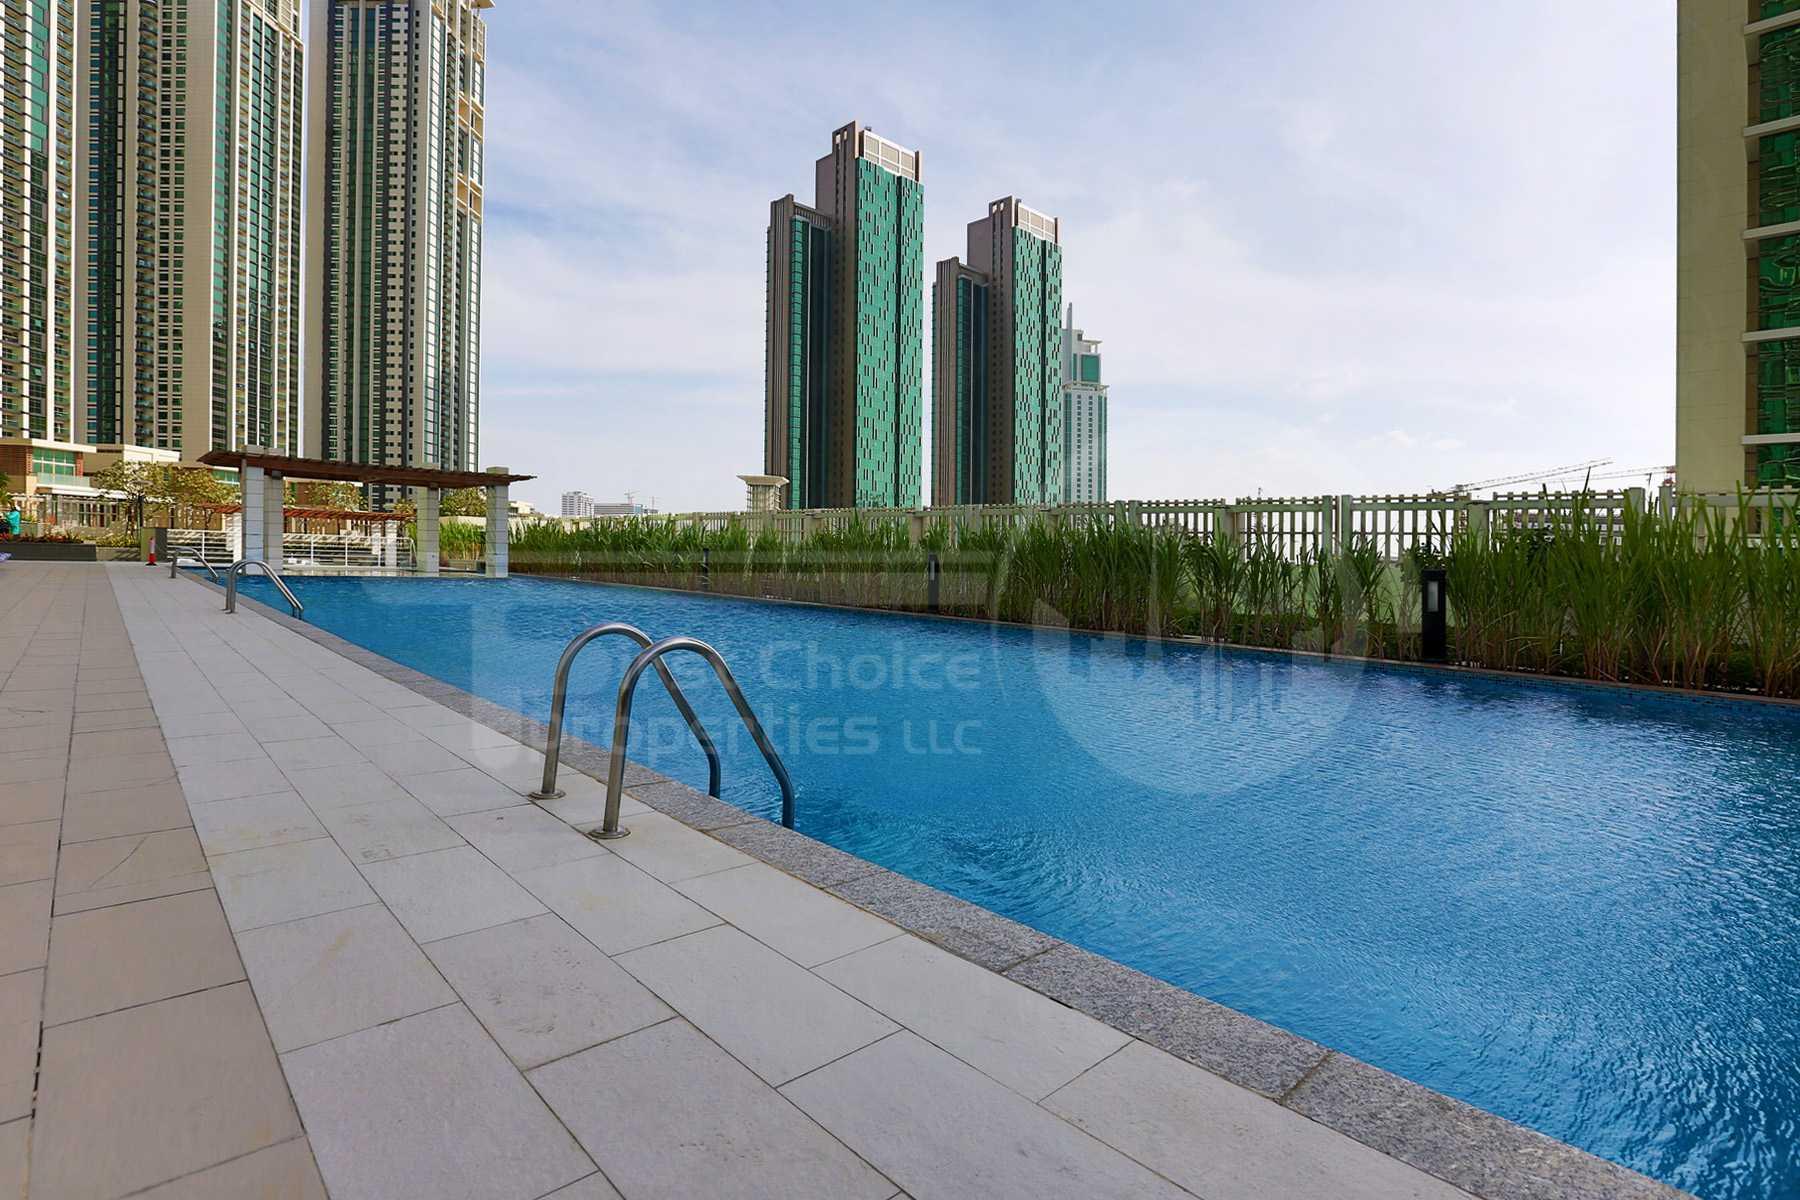 Studio - 1BR - 2BR - 3BR - 4BR Apartment - Abu Dhabi - UAE - Al Reem Island - Tala Tower - Outside View (7).jpg